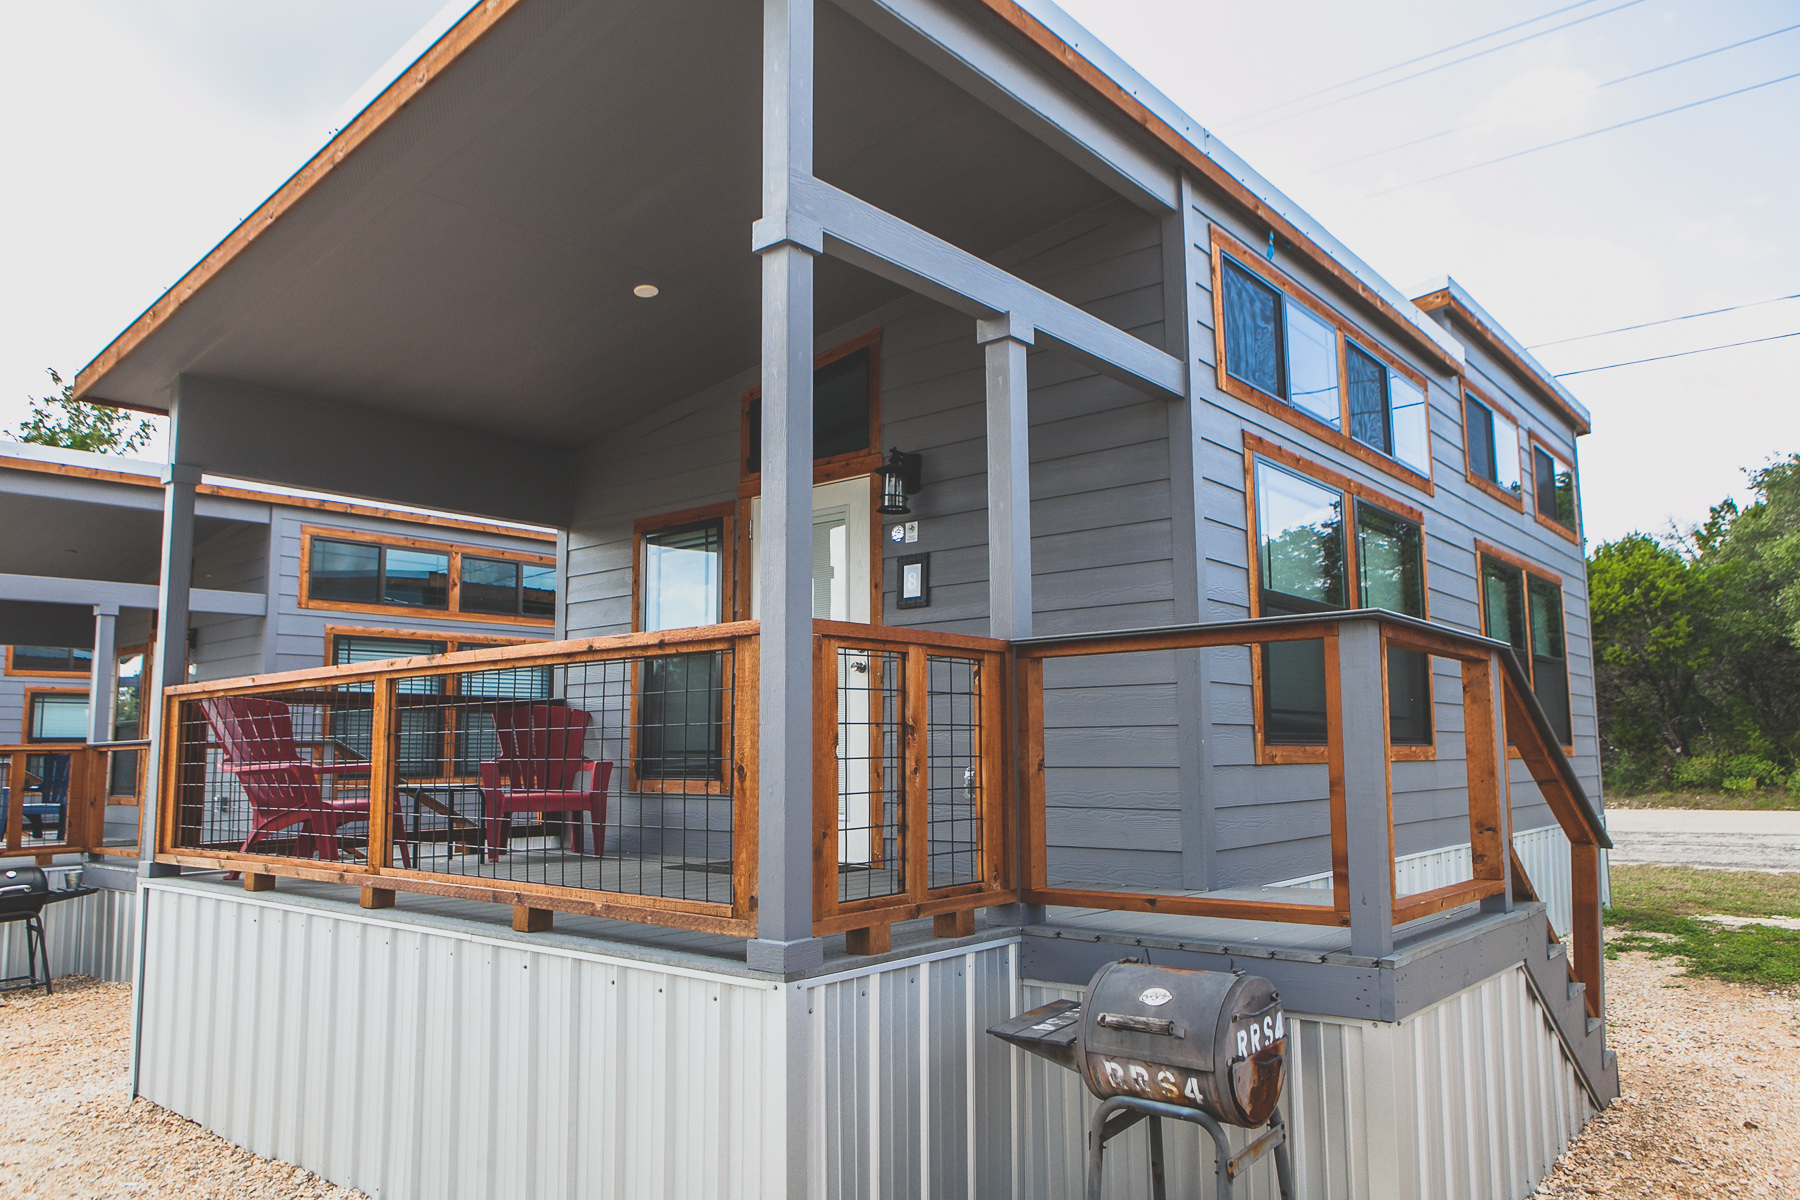 #8 QUANAH TINY HOUSE